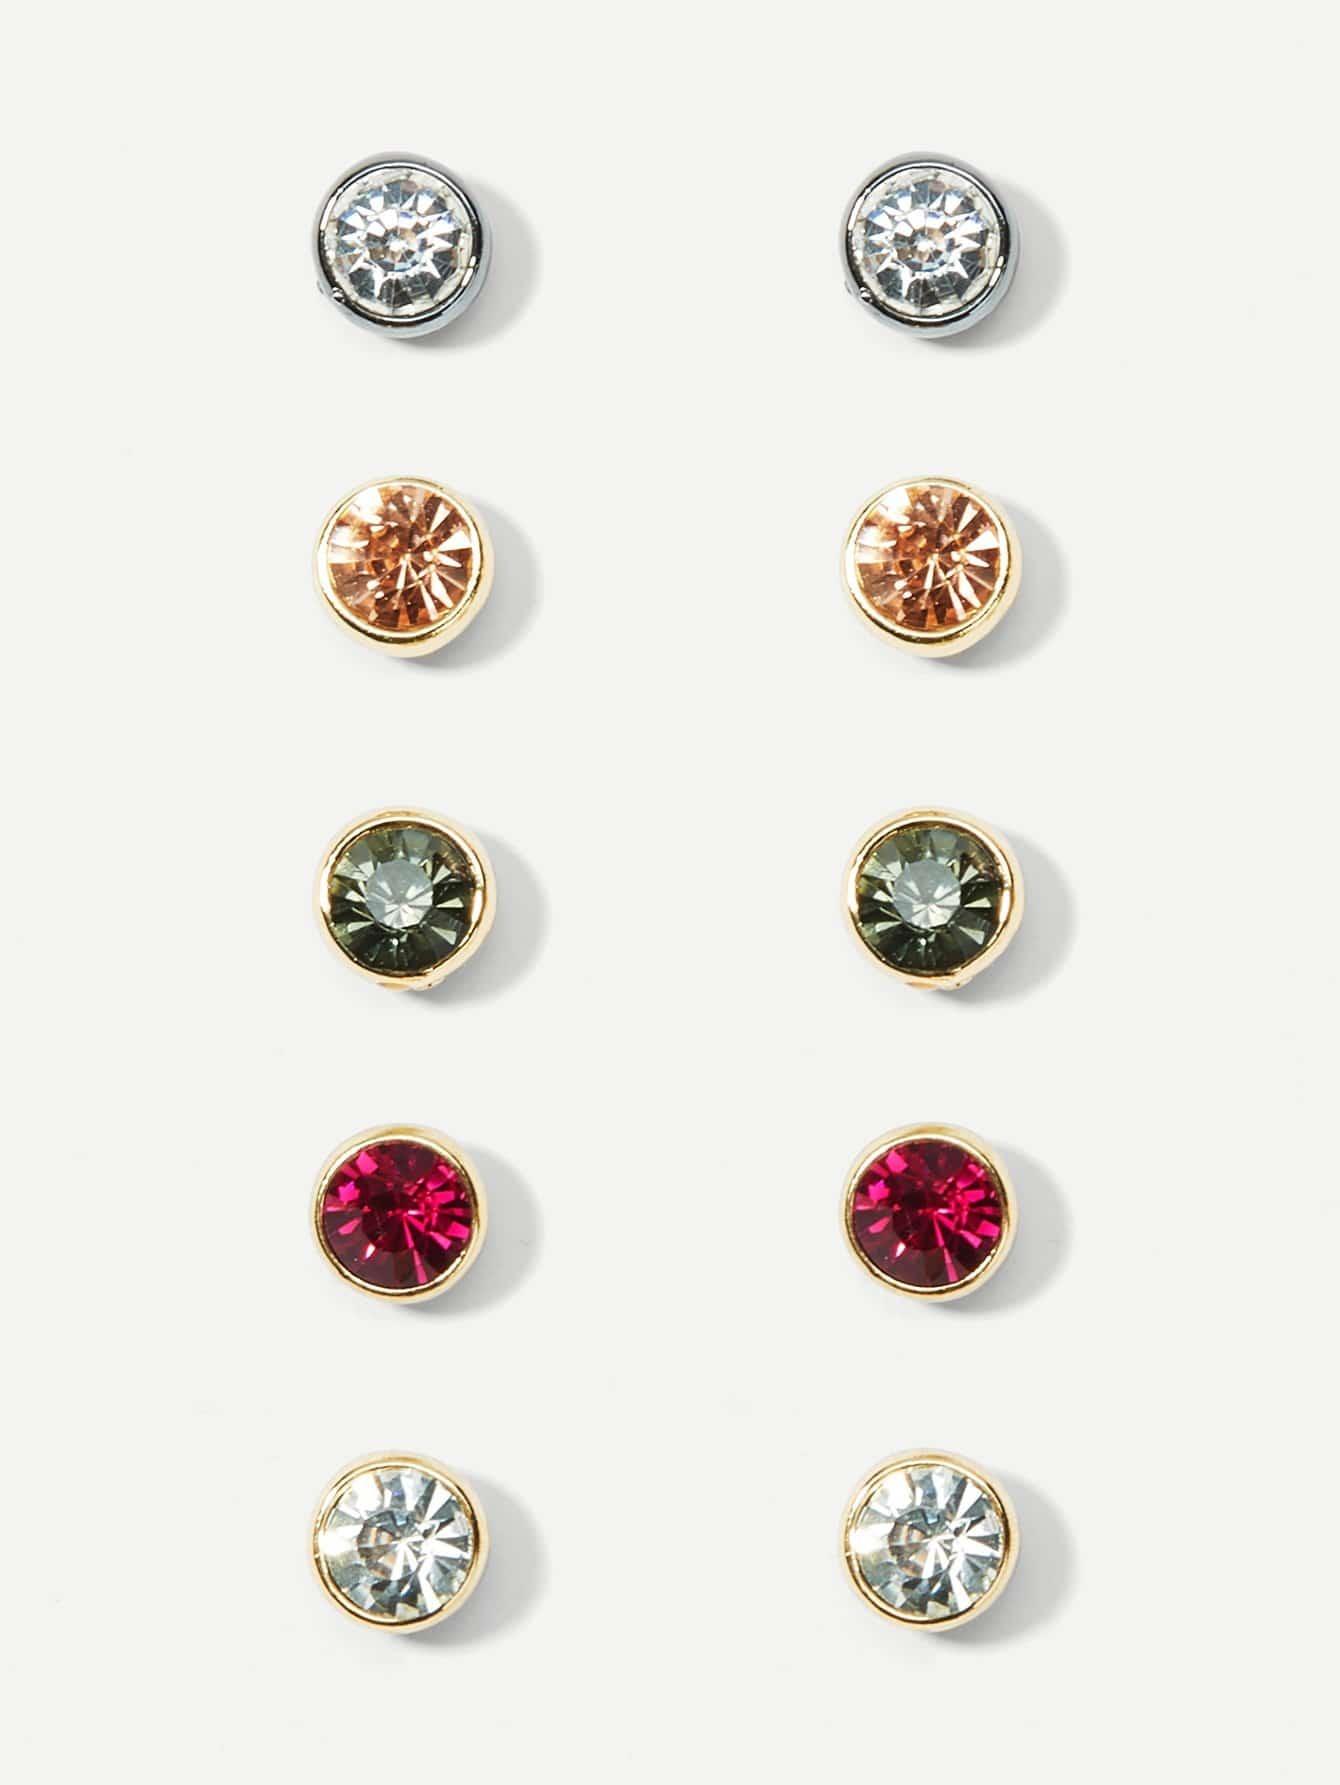 Simple Rhinestone Stud Earrings Set 5pairs rhinestone alloy stud earrings set